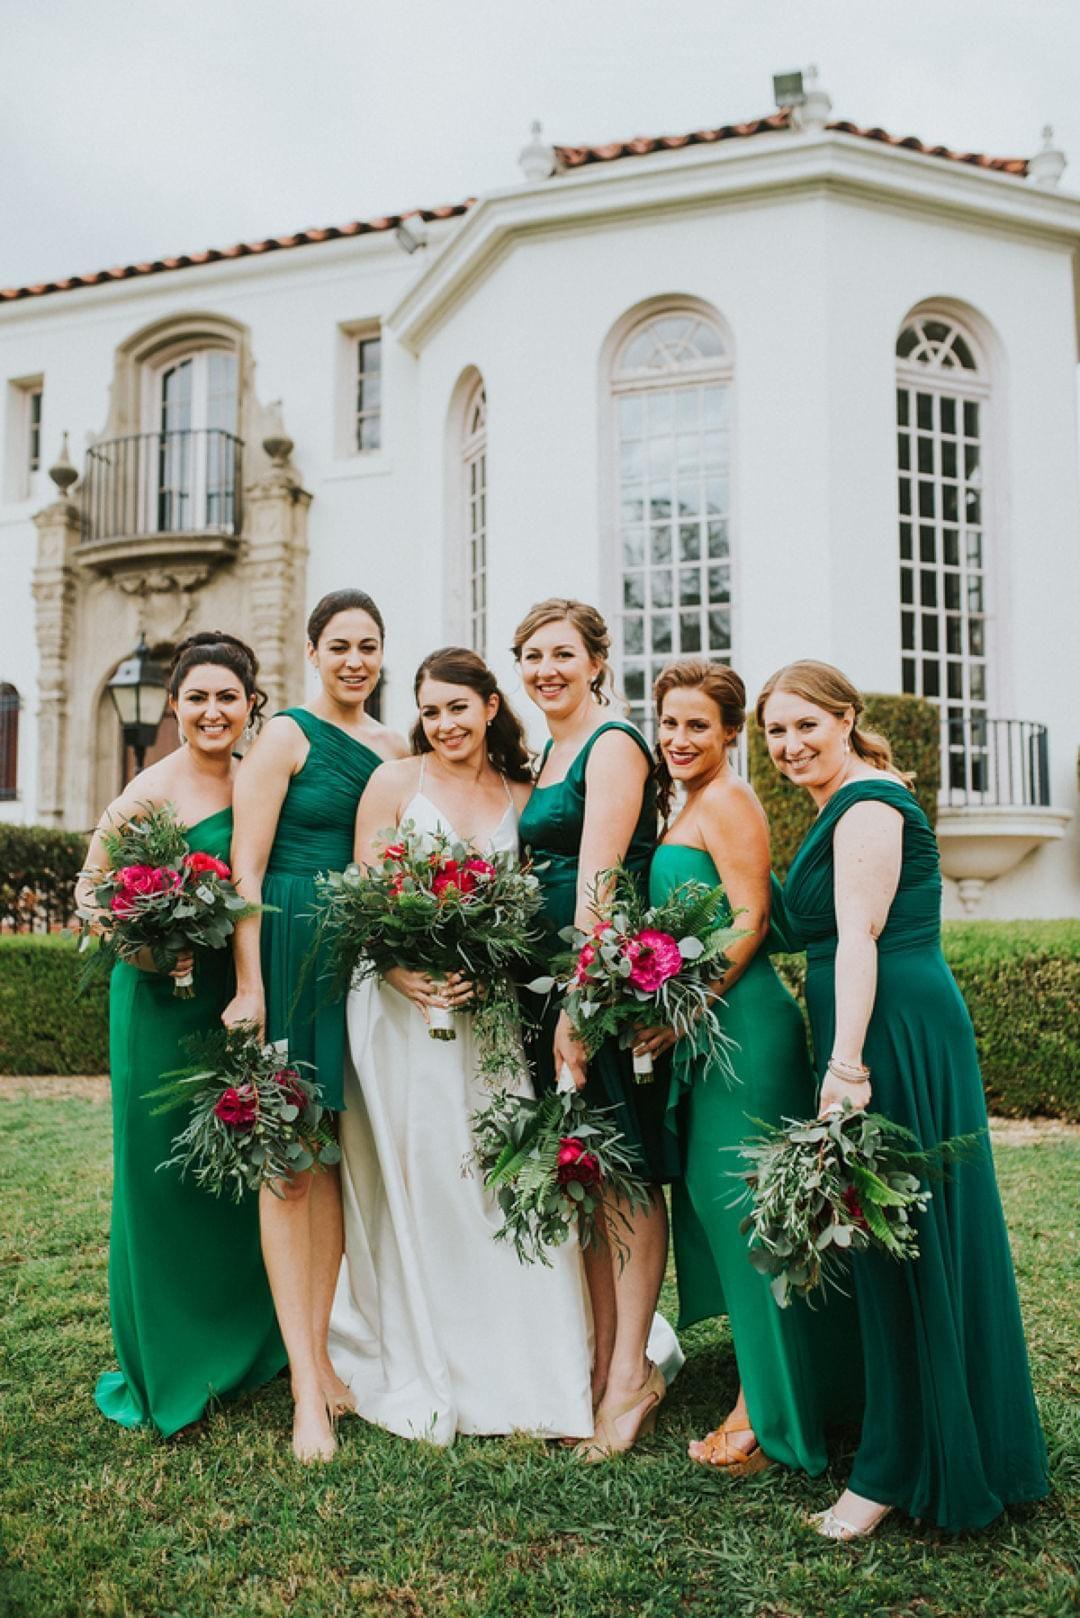 Romantic Al Fresco Garden Fete Orange County Ca Wedding Bridesmaid Dress Colors Mismatched Bridesmaids